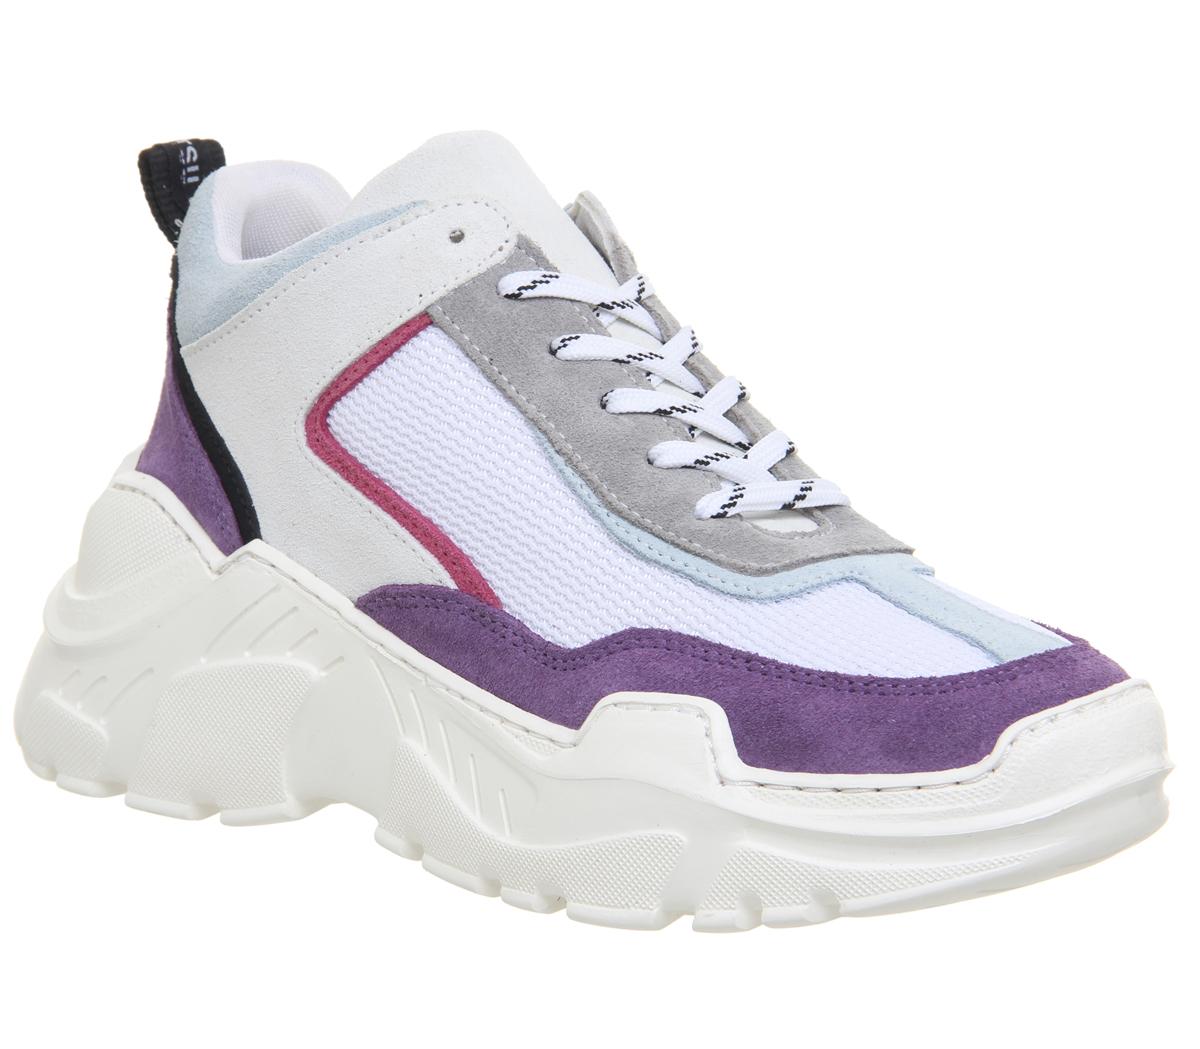 Damenschuhe Oki Kutsu Momo Trainers Schuhes Weiß MINT PINK Trainers Schuhes Trainers a205ac